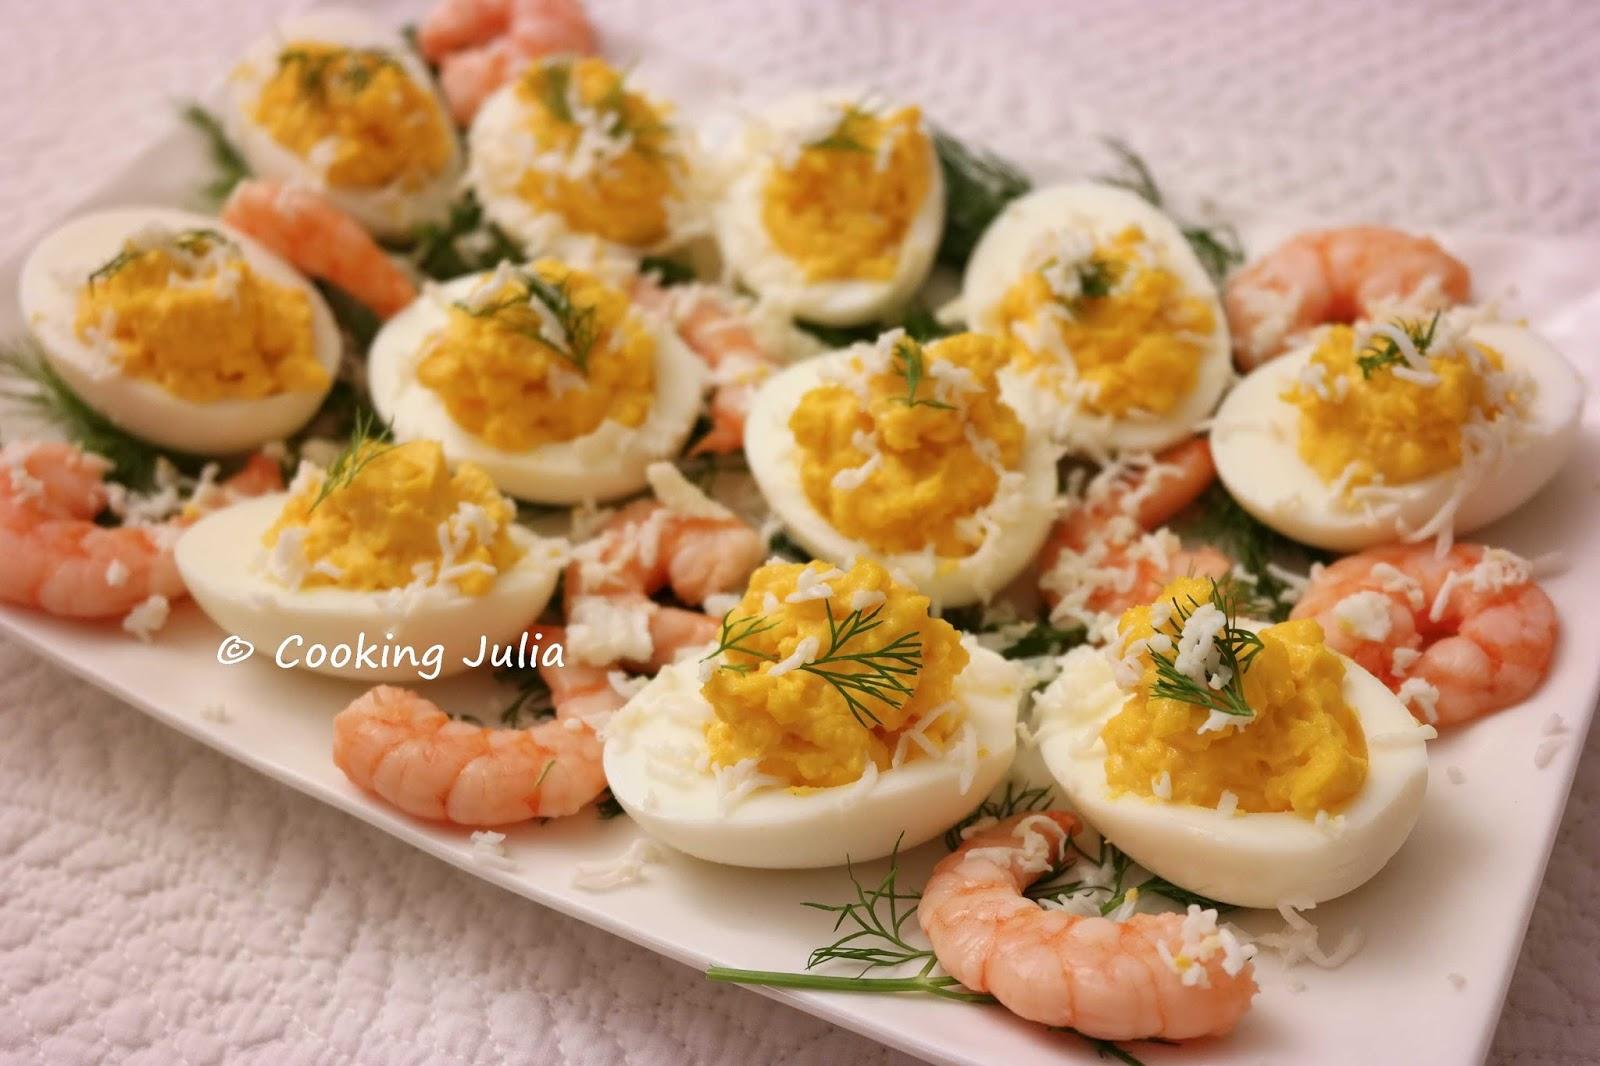 cooking julia ufs mimosa aux crevettes. Black Bedroom Furniture Sets. Home Design Ideas